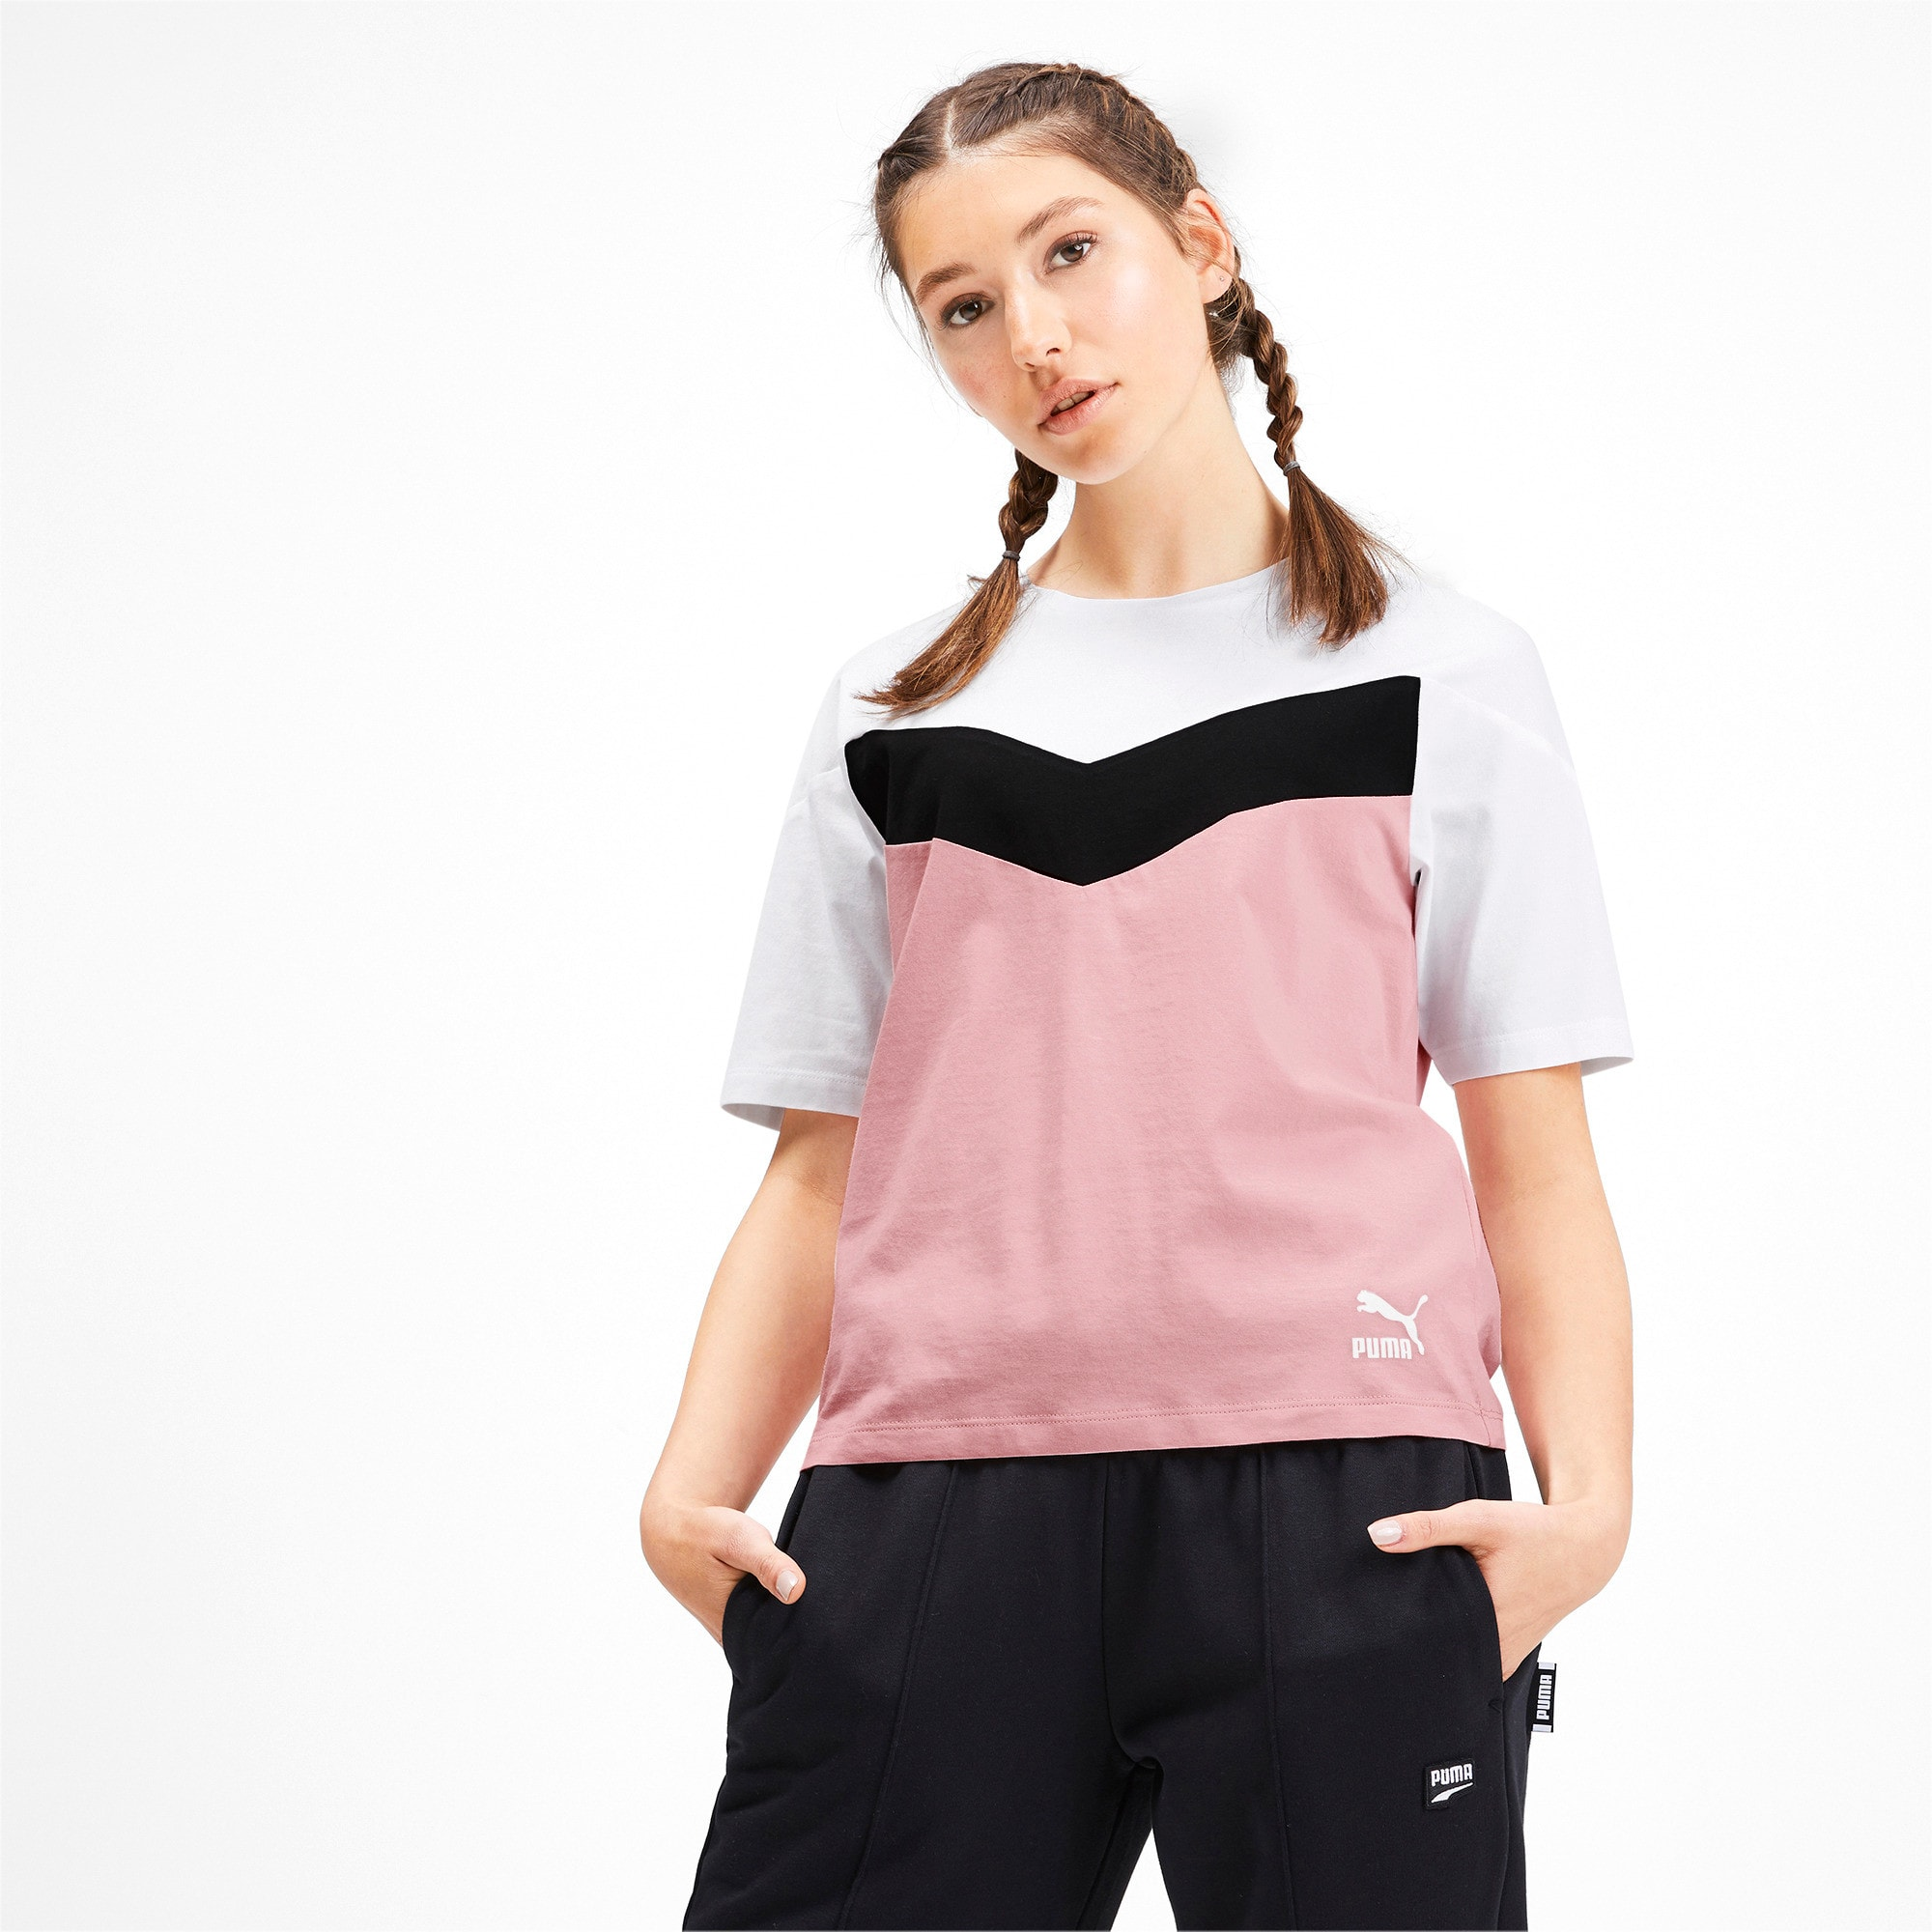 Thumbnail 2 of プーマ XTG ウィメンズ CB SS Tシャツ 半袖, Bridal Rose, medium-JPN